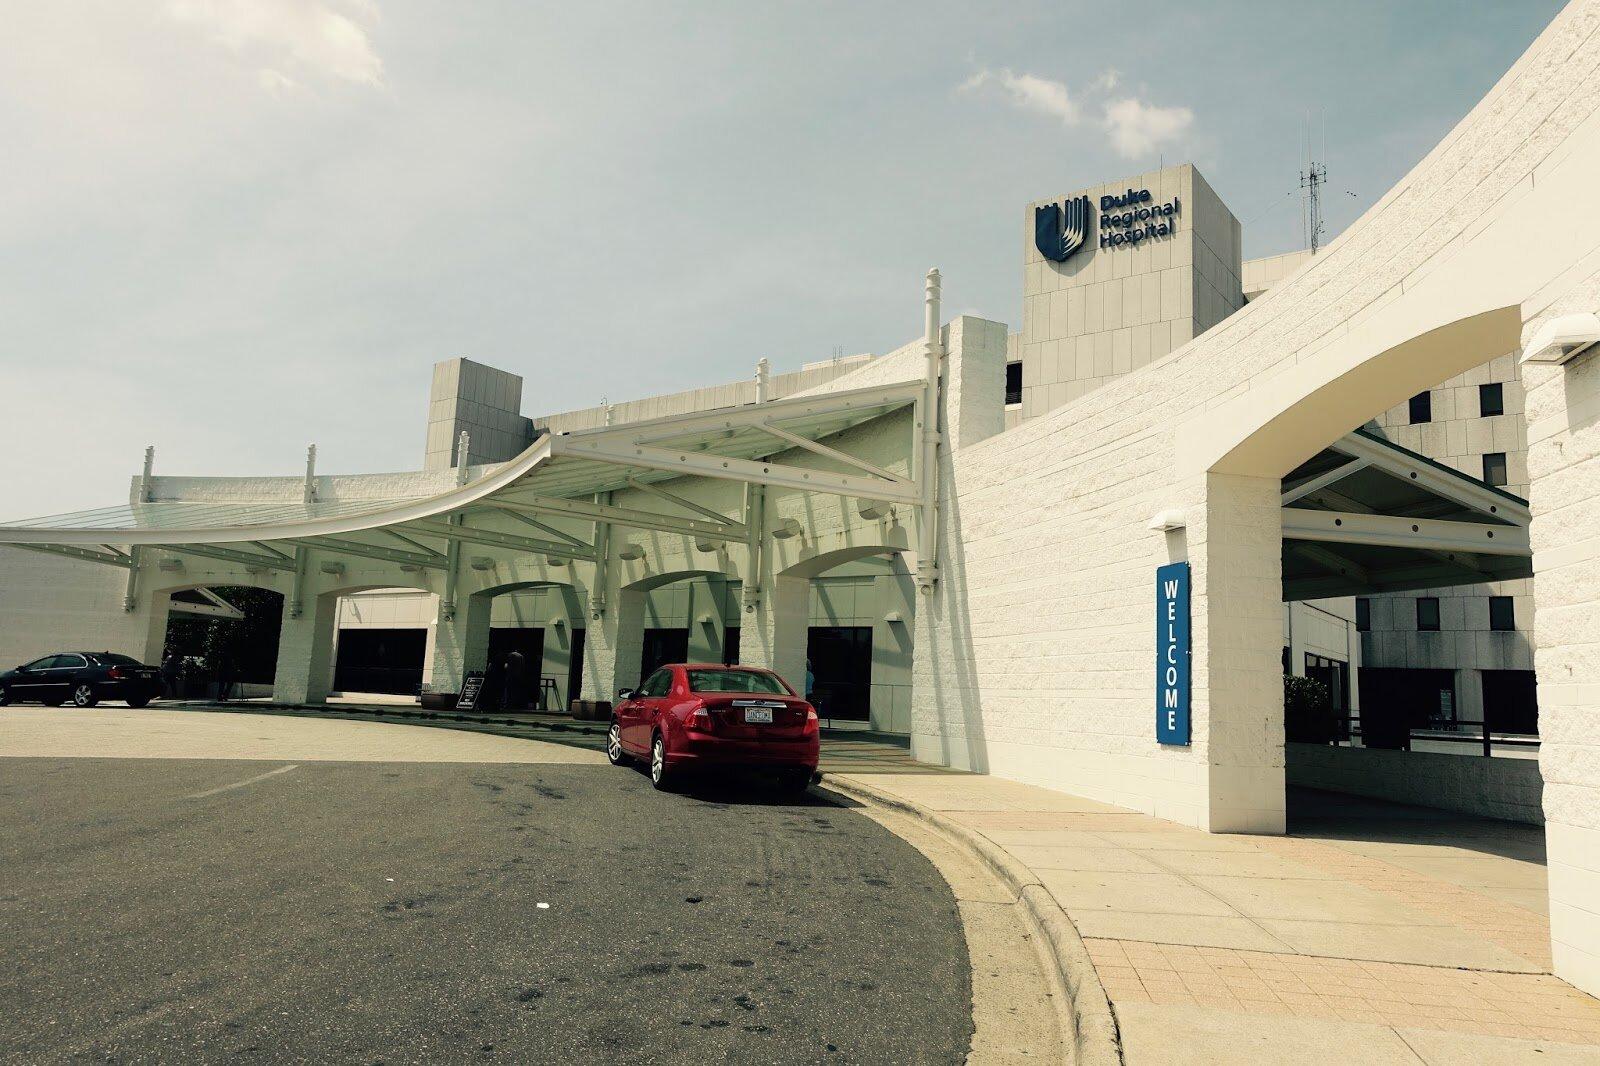 A la découverte de Duke Regional Hospital ! - 6 à Durham, NC USA